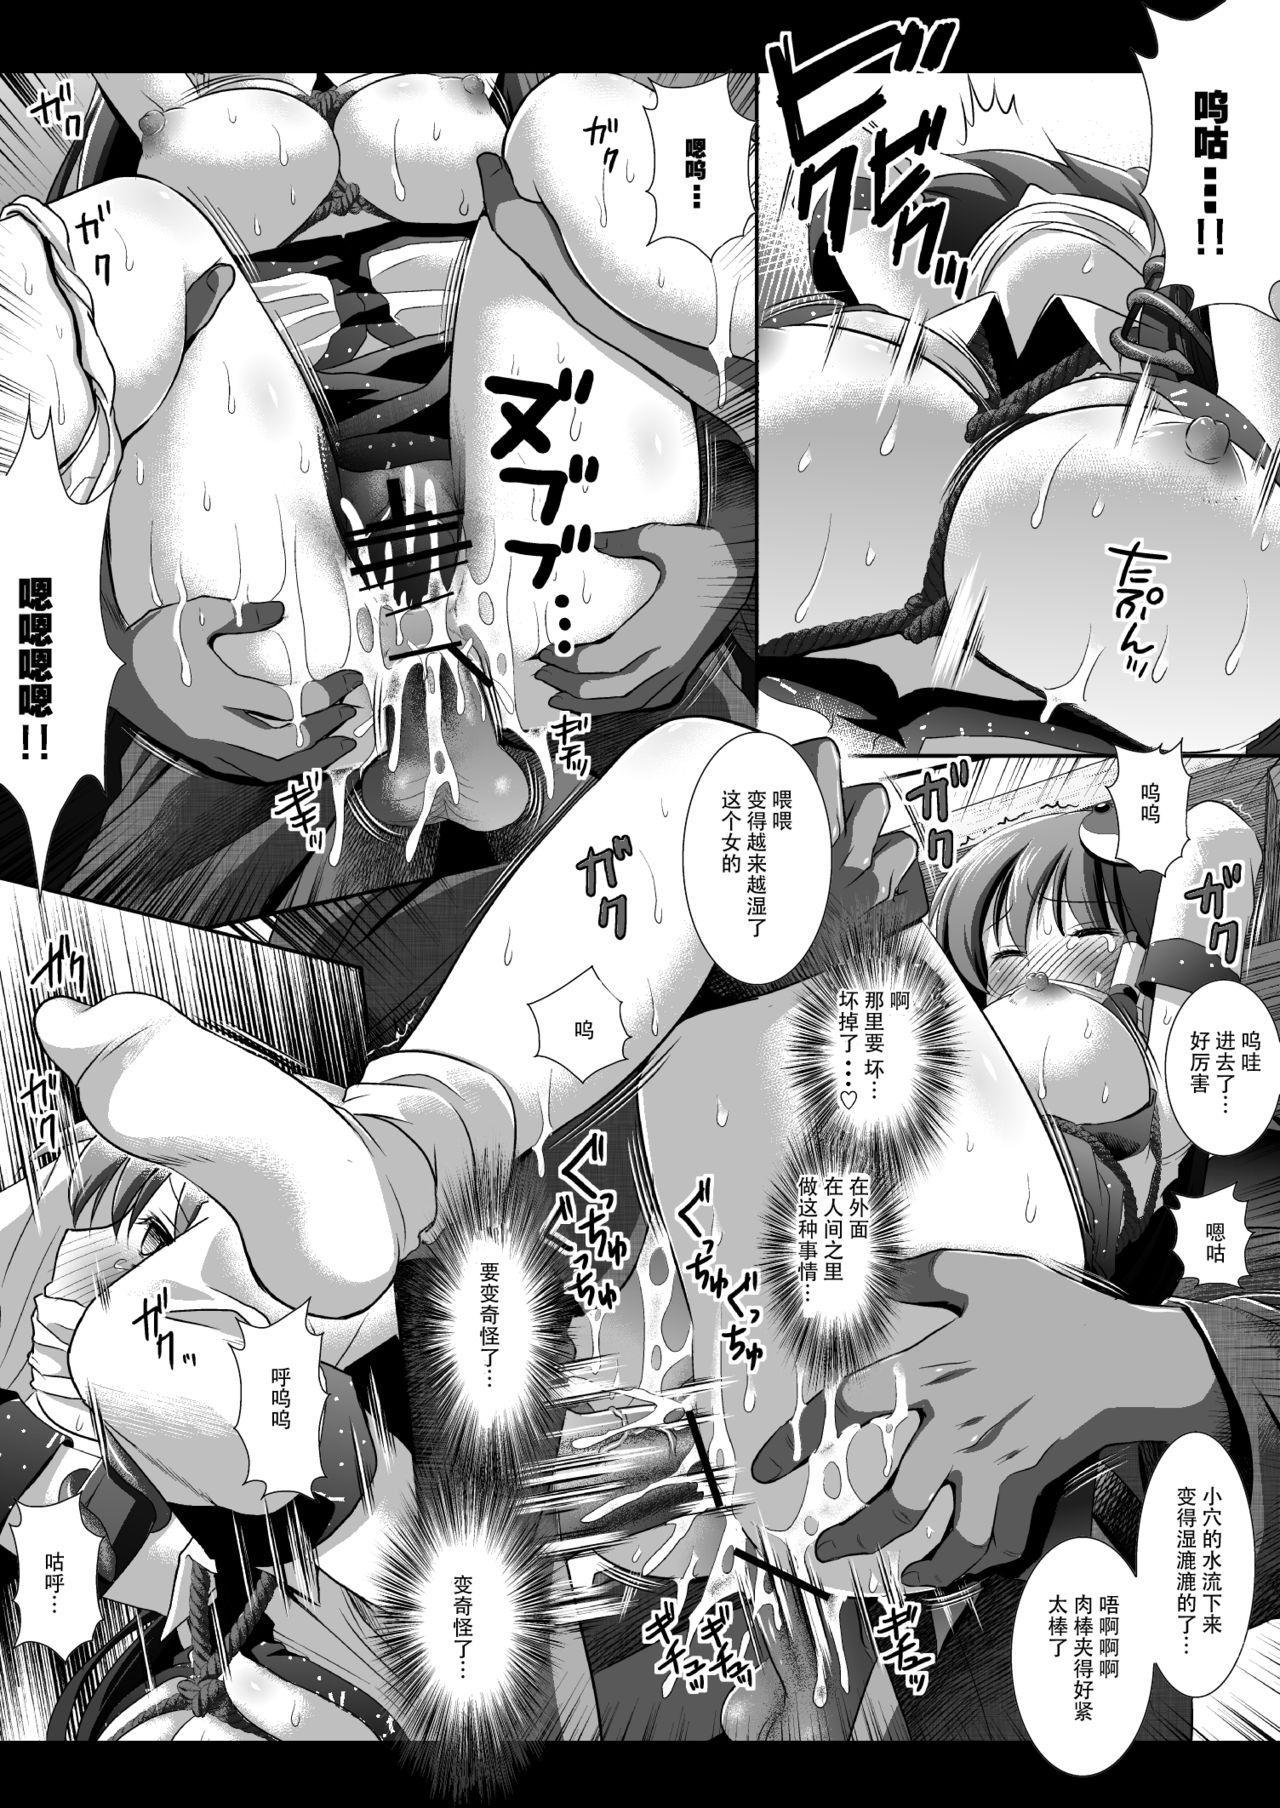 [Nagiyamasugi (Nagiyama)] Touhou Ryoujoku 14 (Touhou Project)) [Chinese] [靴下汉化组] [Digital] 14